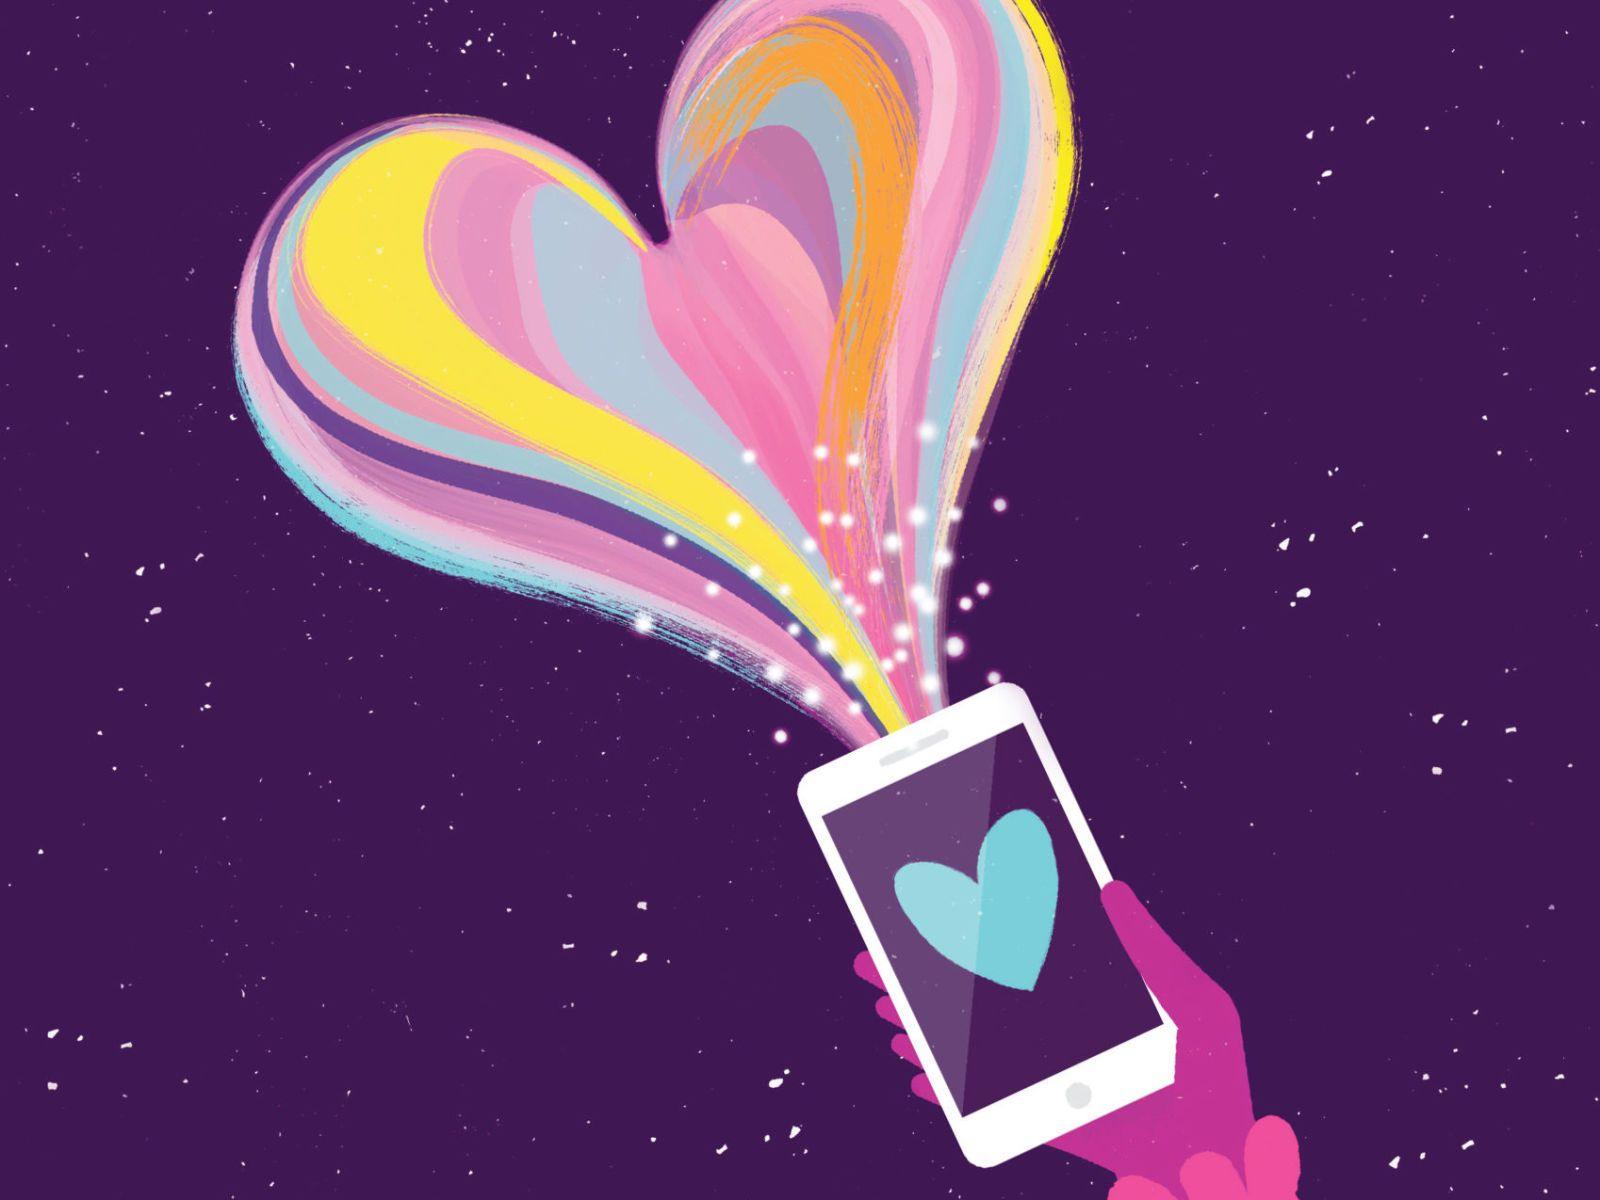 Susu sapi murni online dating